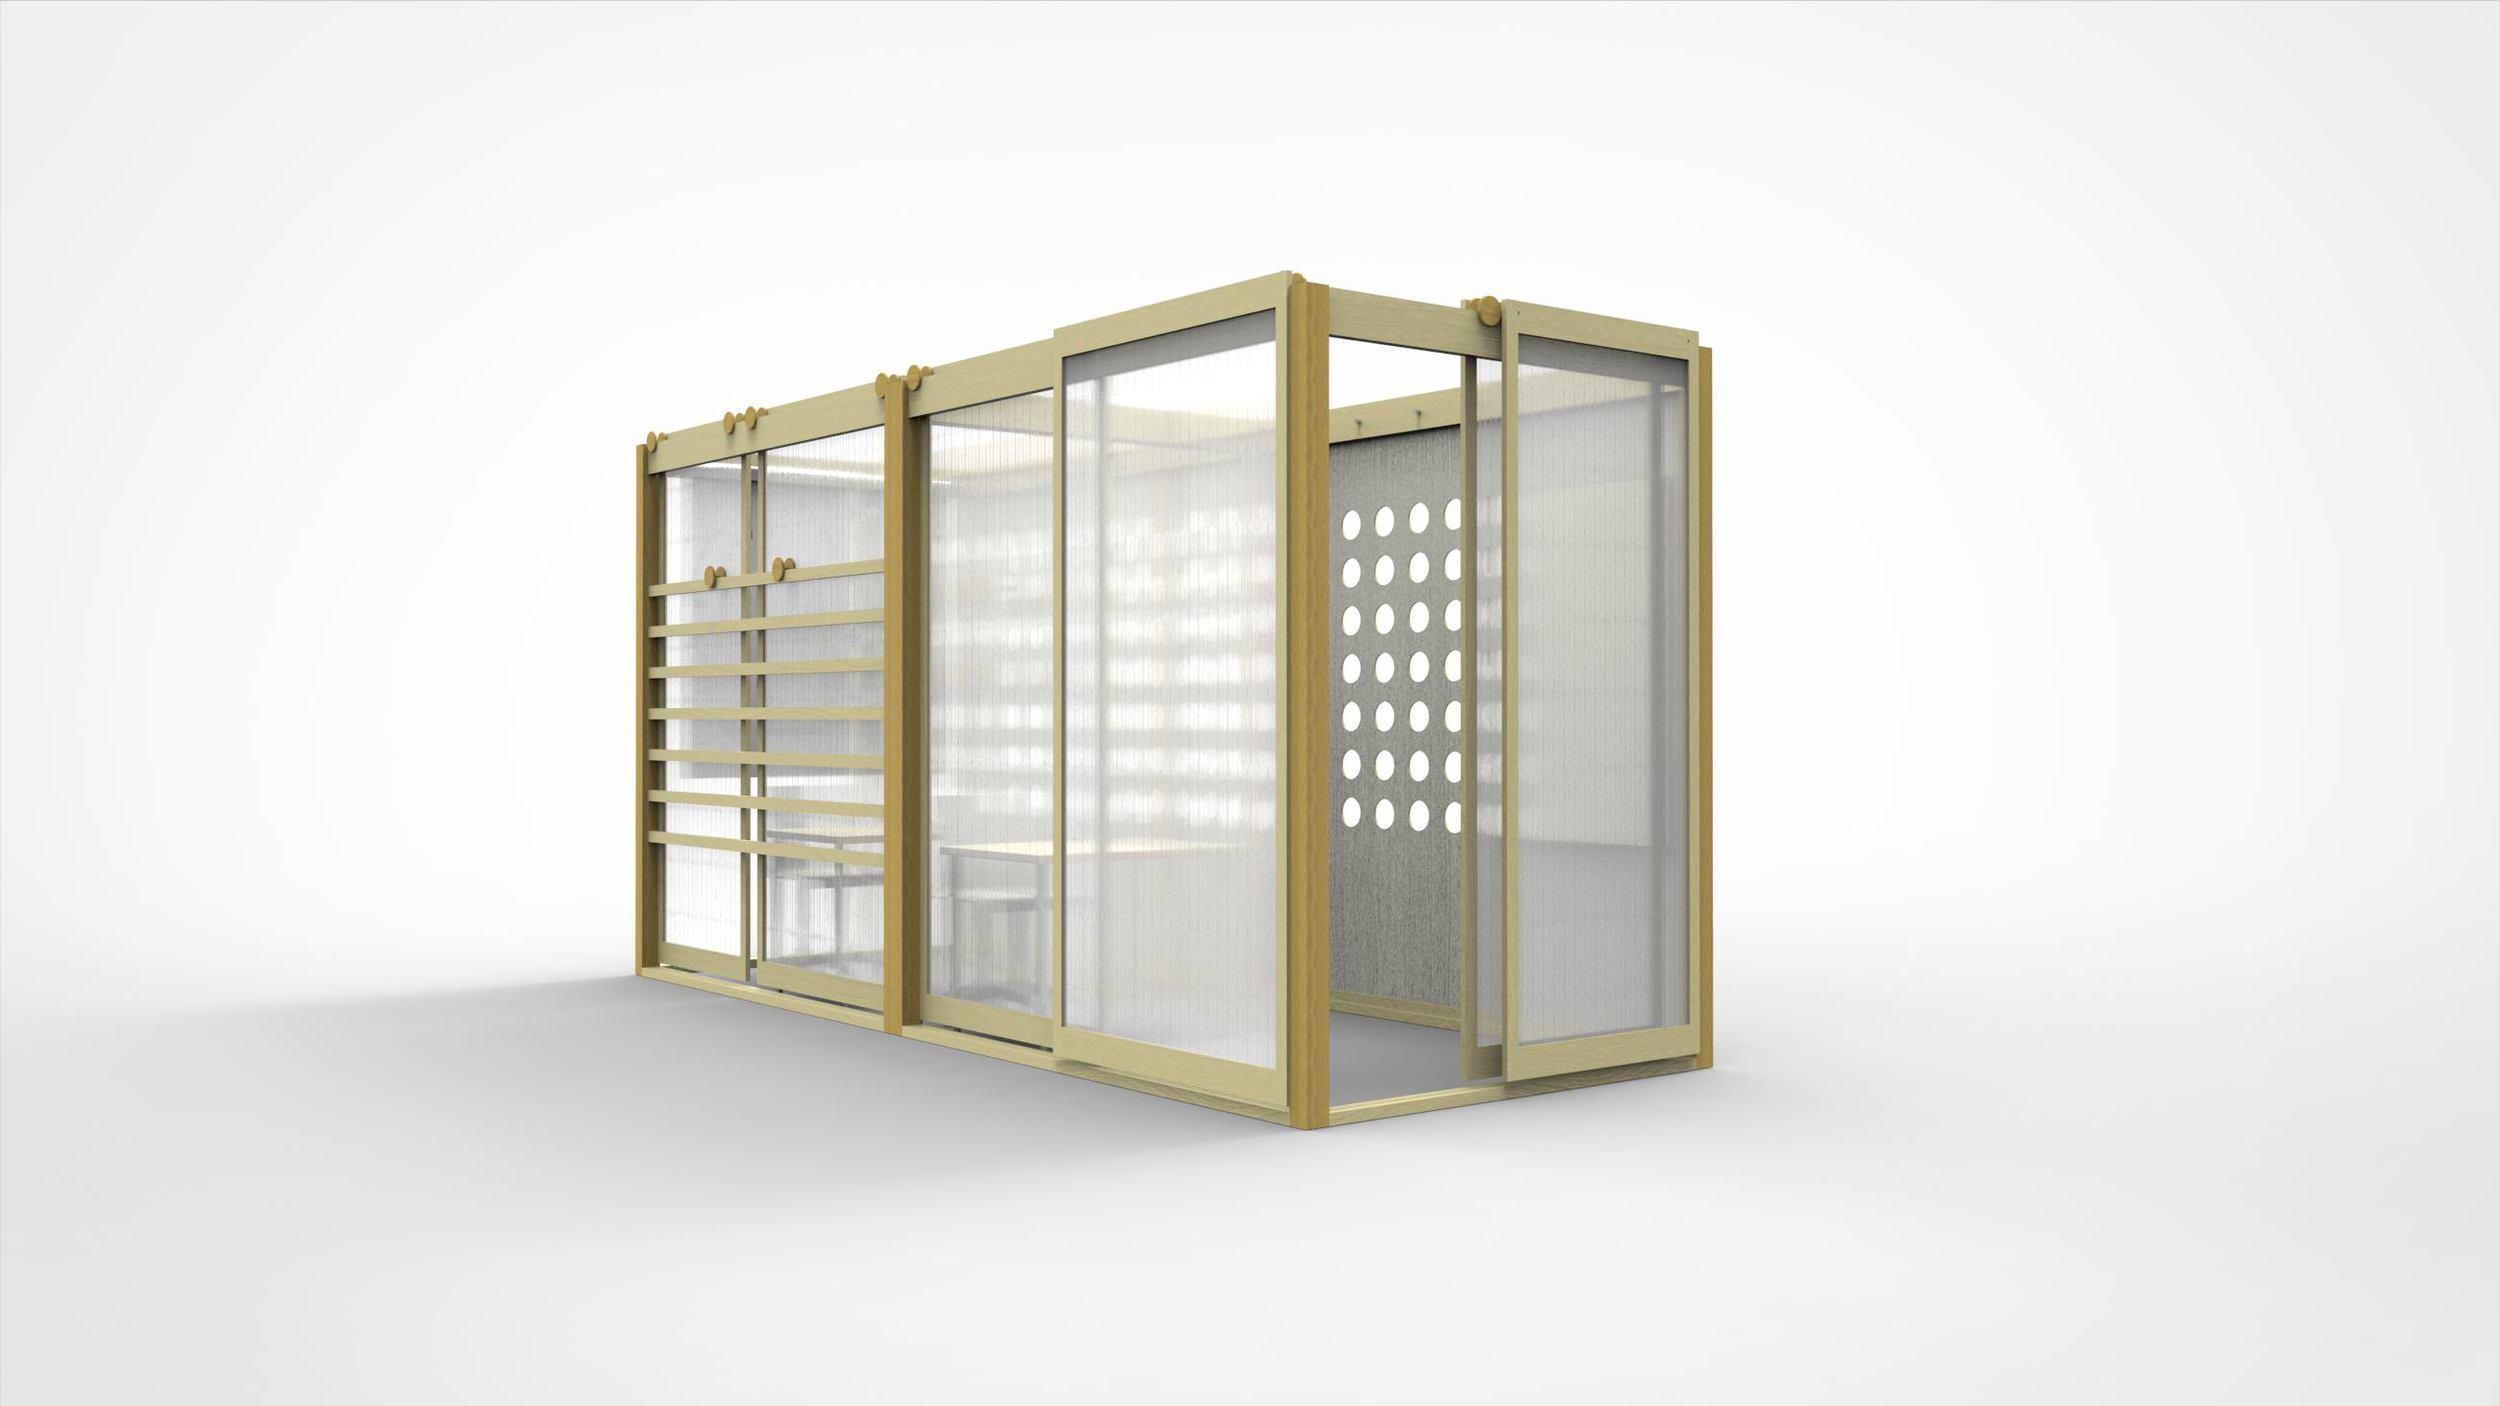 Konisa Studio | OBJEKT Series - Wube Smart Workspace - Studio Design for Tight Environments